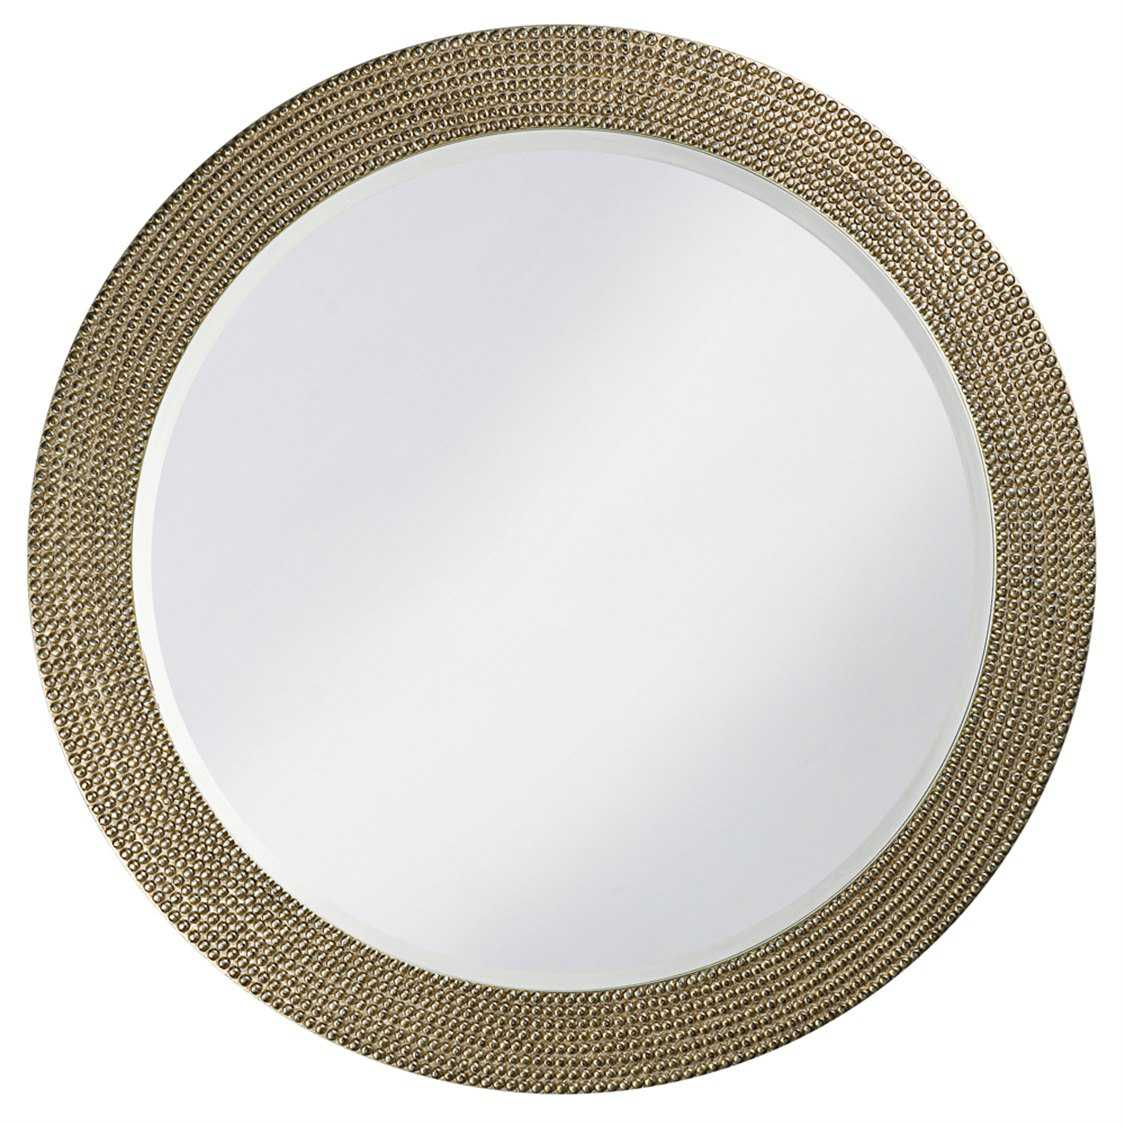 Howard elliott lancelot 42 round silver leaf wall mirror for Round silver wall mirror